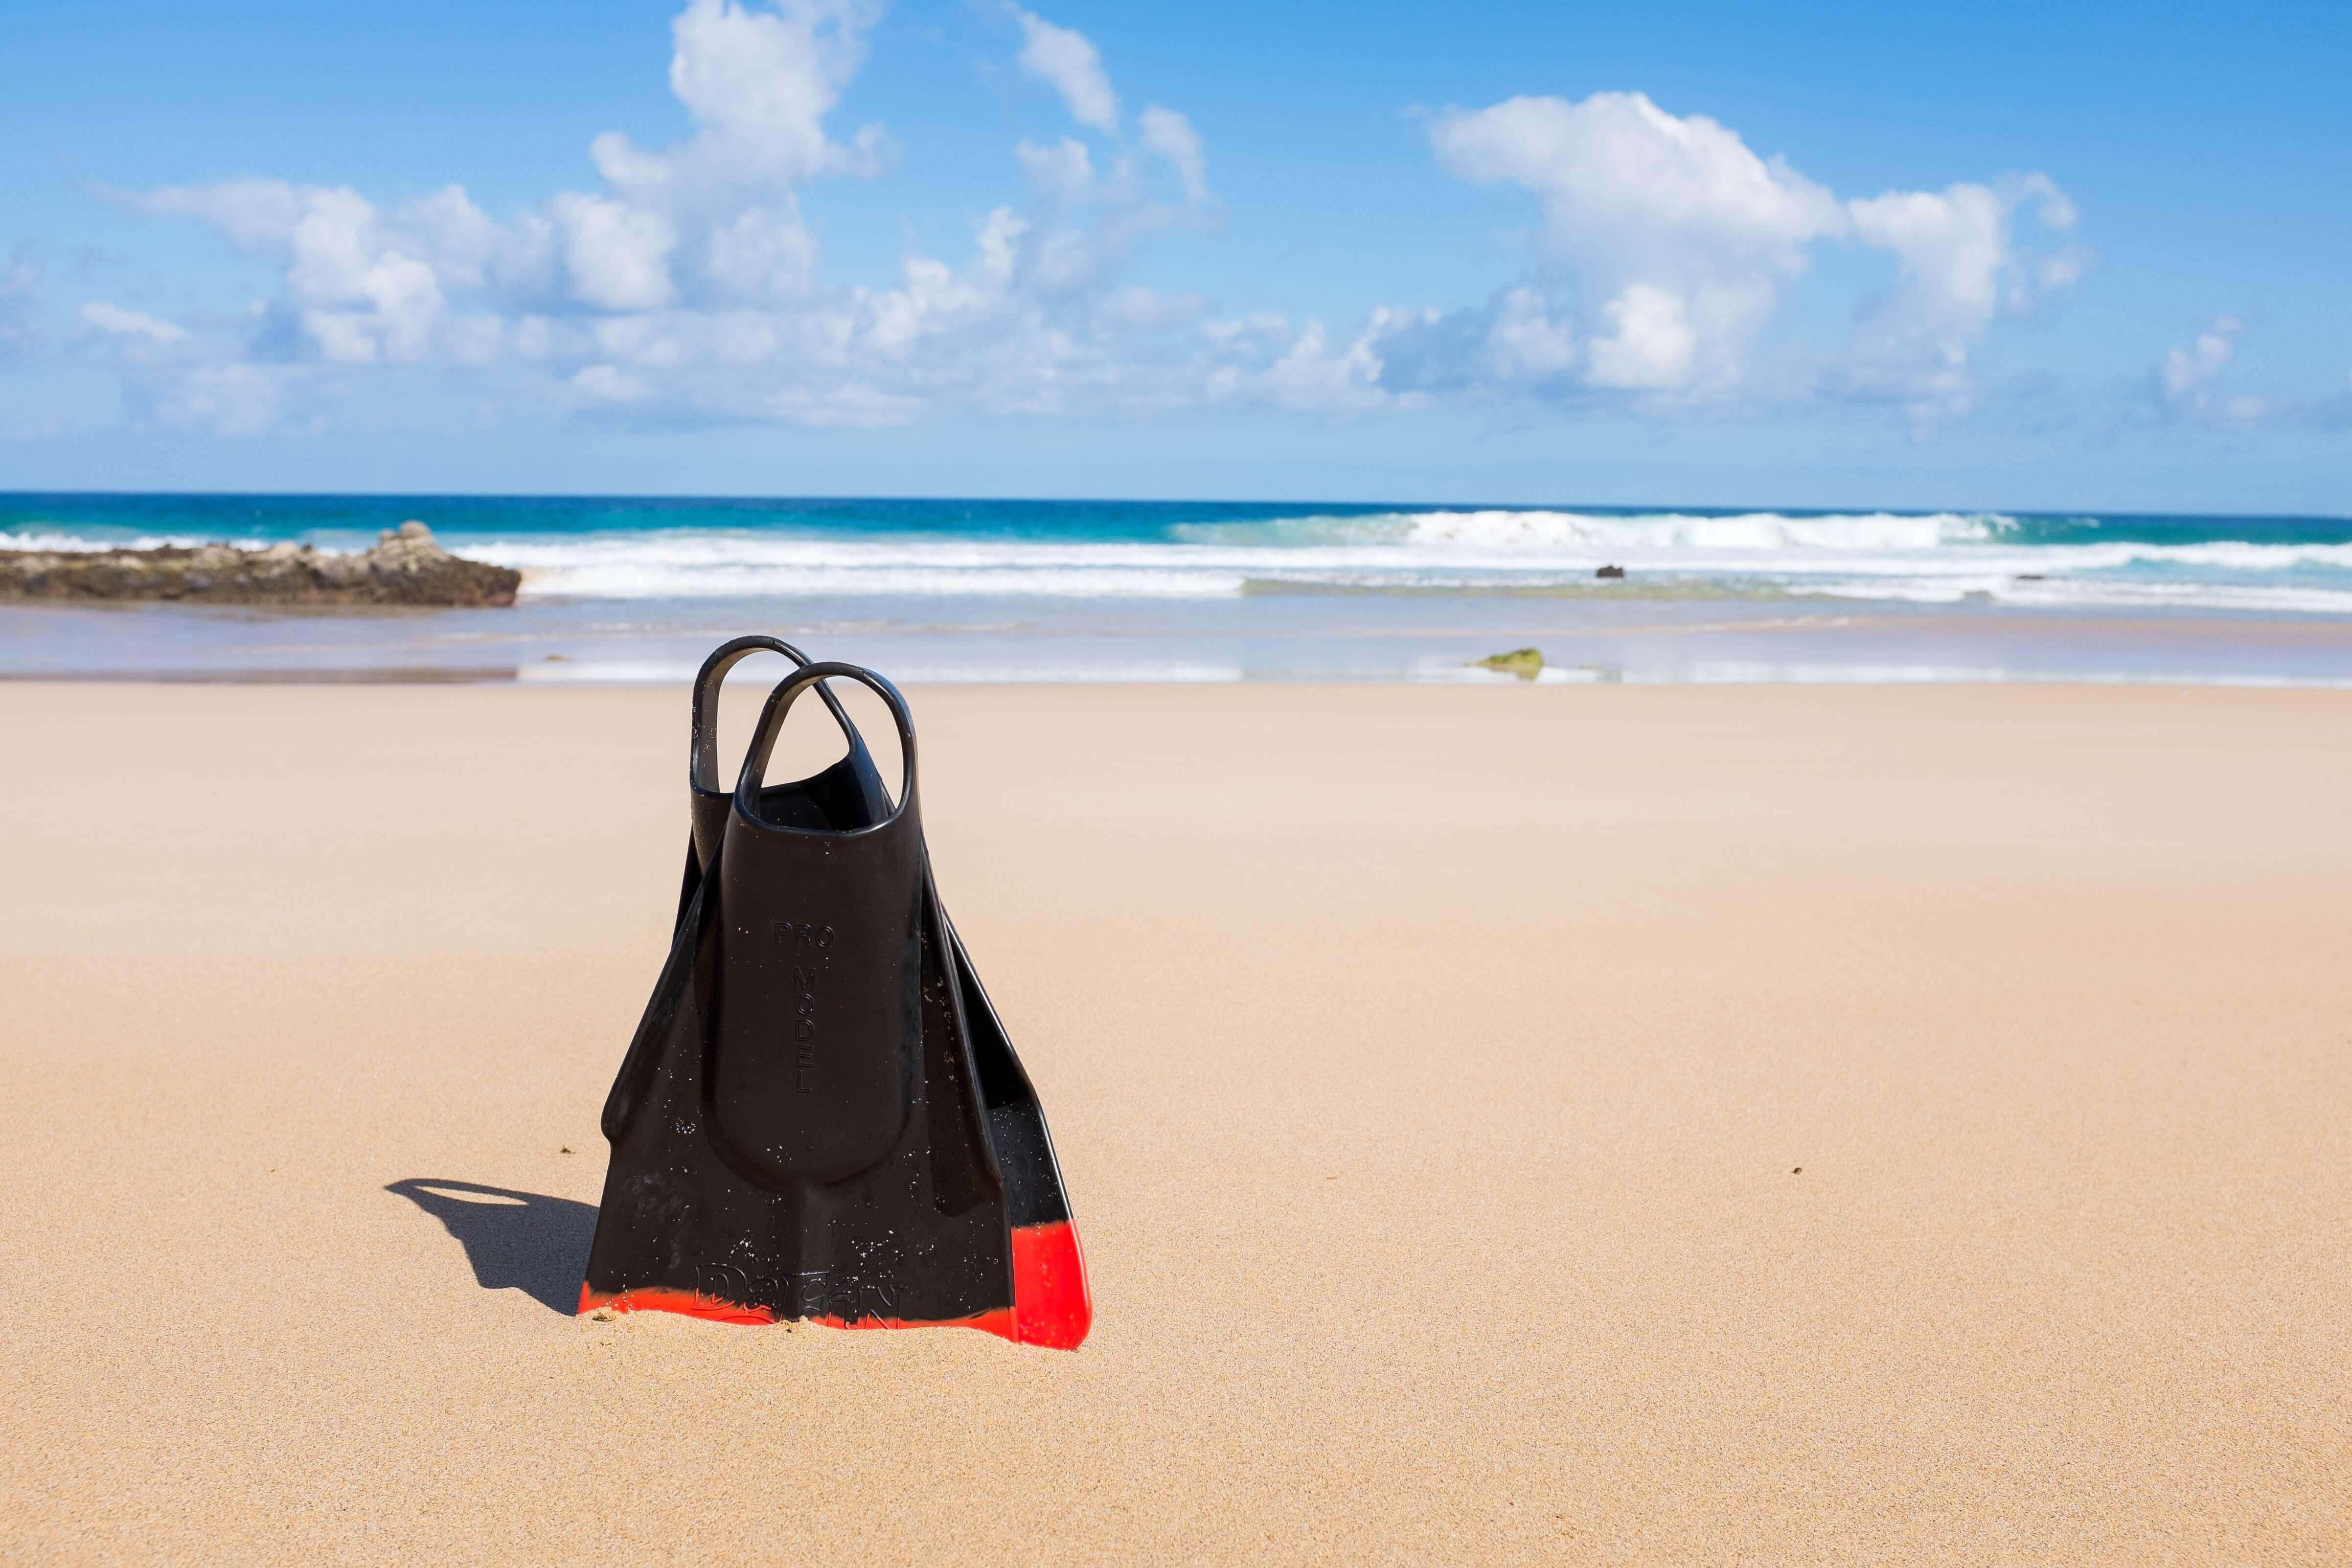 scuba fins on a beach